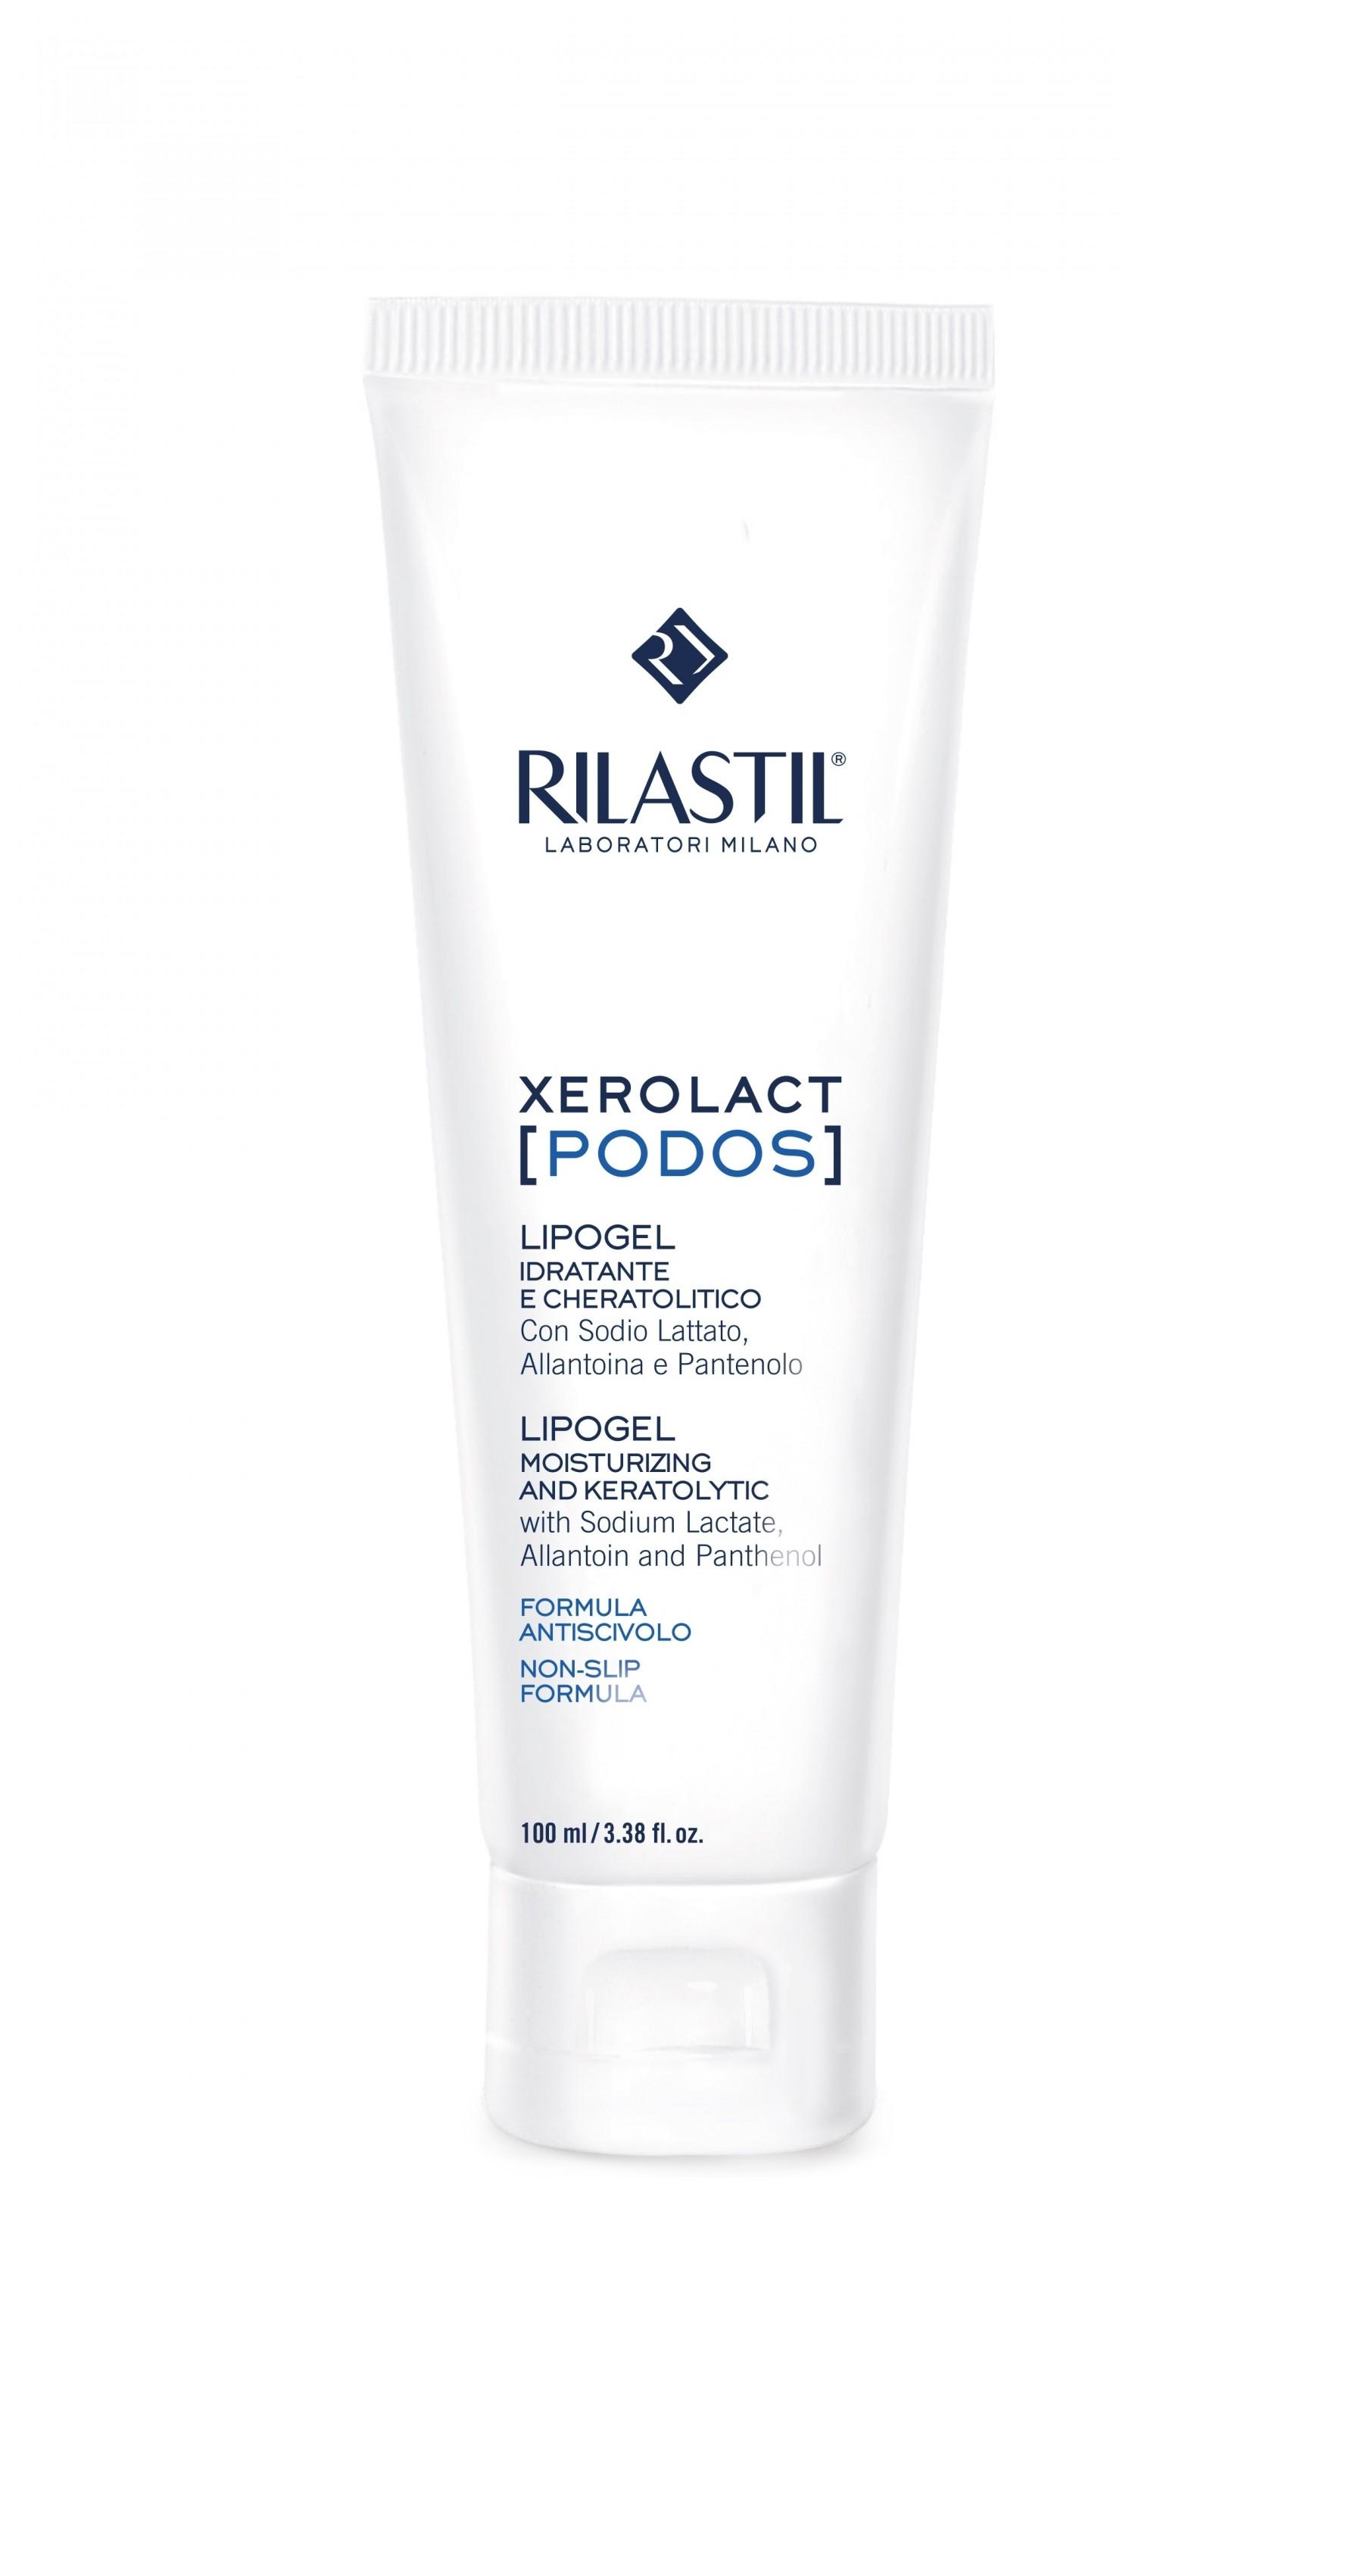 Rilastil Xerolact [Podos] Lipogel Idratante & Cheratolitico 100ml